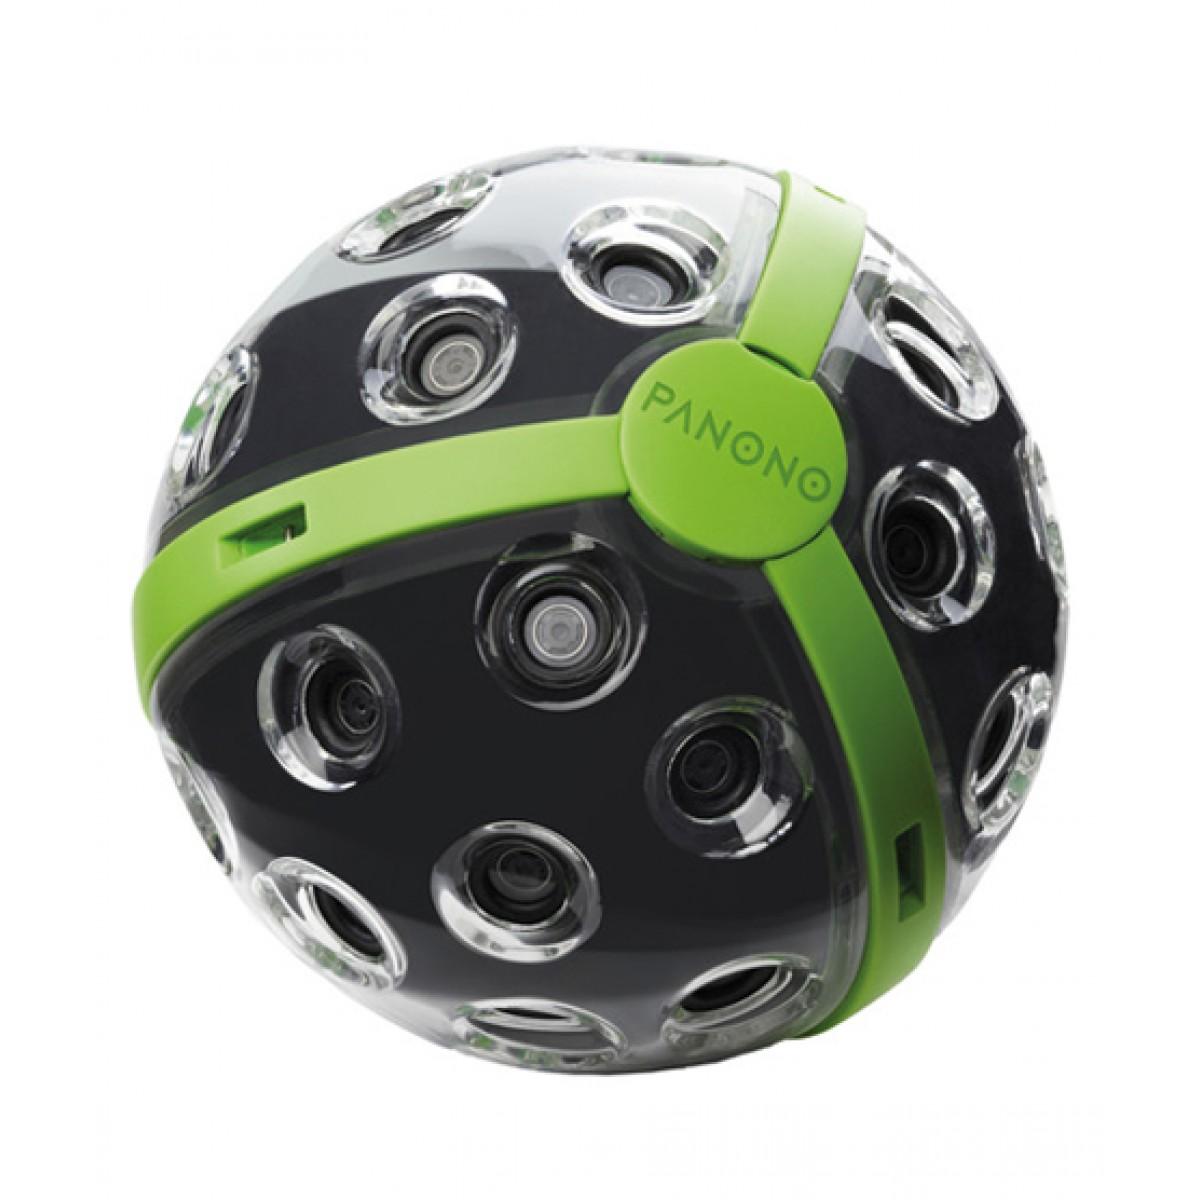 Panono 360 Degree Camera